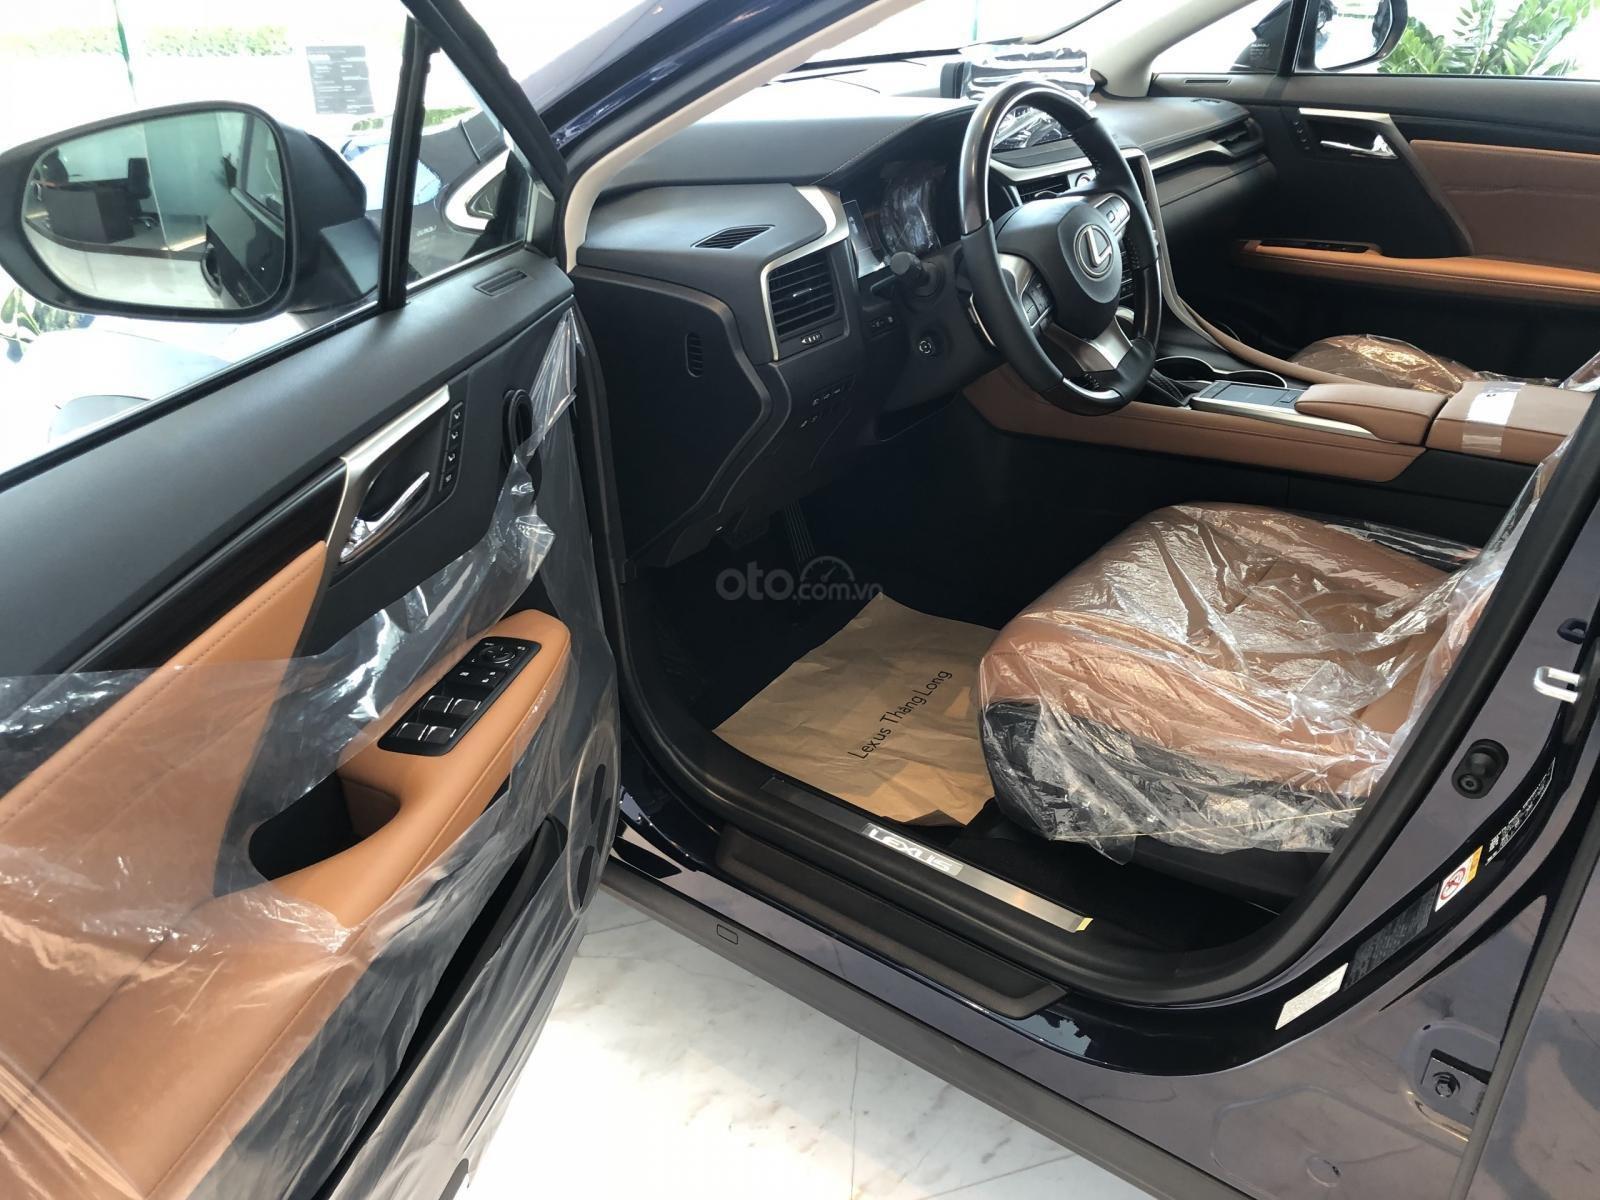 Bán Lexus RX 450h 2020, màu đen, nhập khẩu (7)